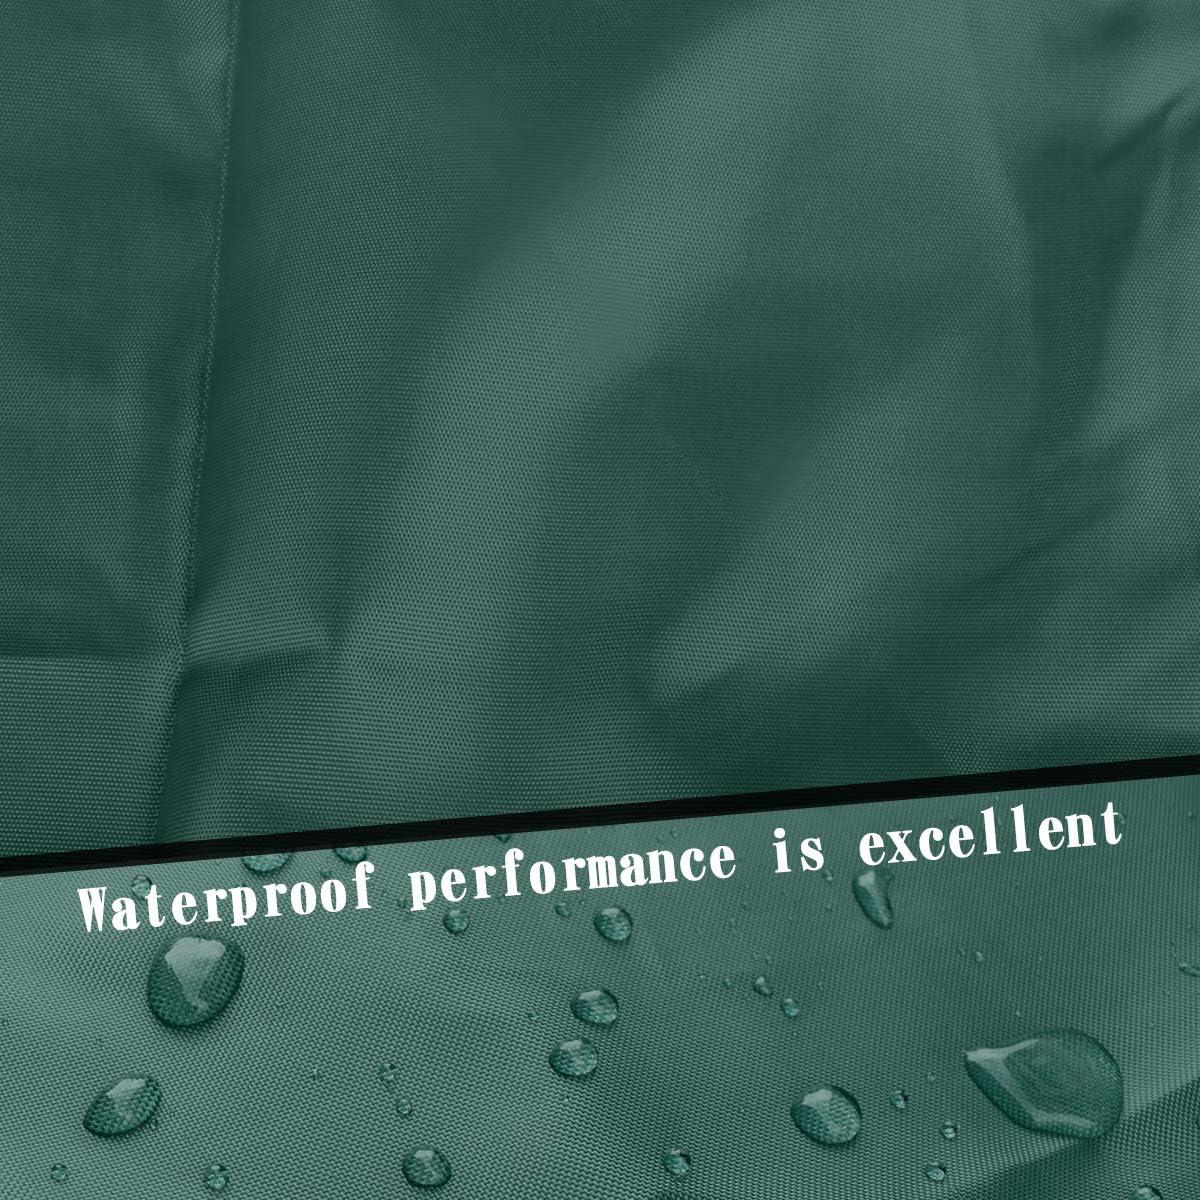 SoGuDio Bimini Top Cover,Suitable for 3-4 Bows Bimini Tops,Effectively Prevent The Erosion of UV sea Water and sea Breeze in Summer,Bimini Top Canopy,Storage Boot Army Green L:68-88IN